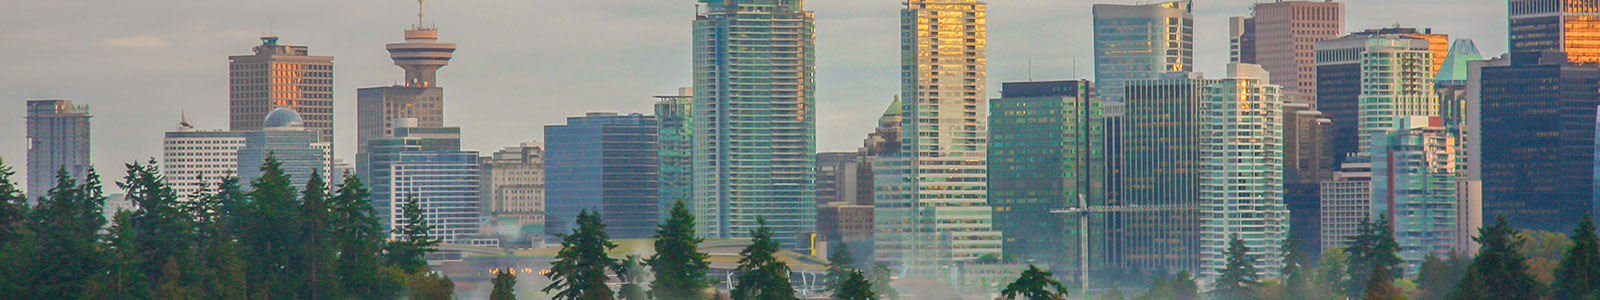 Vancouver's glass buildings